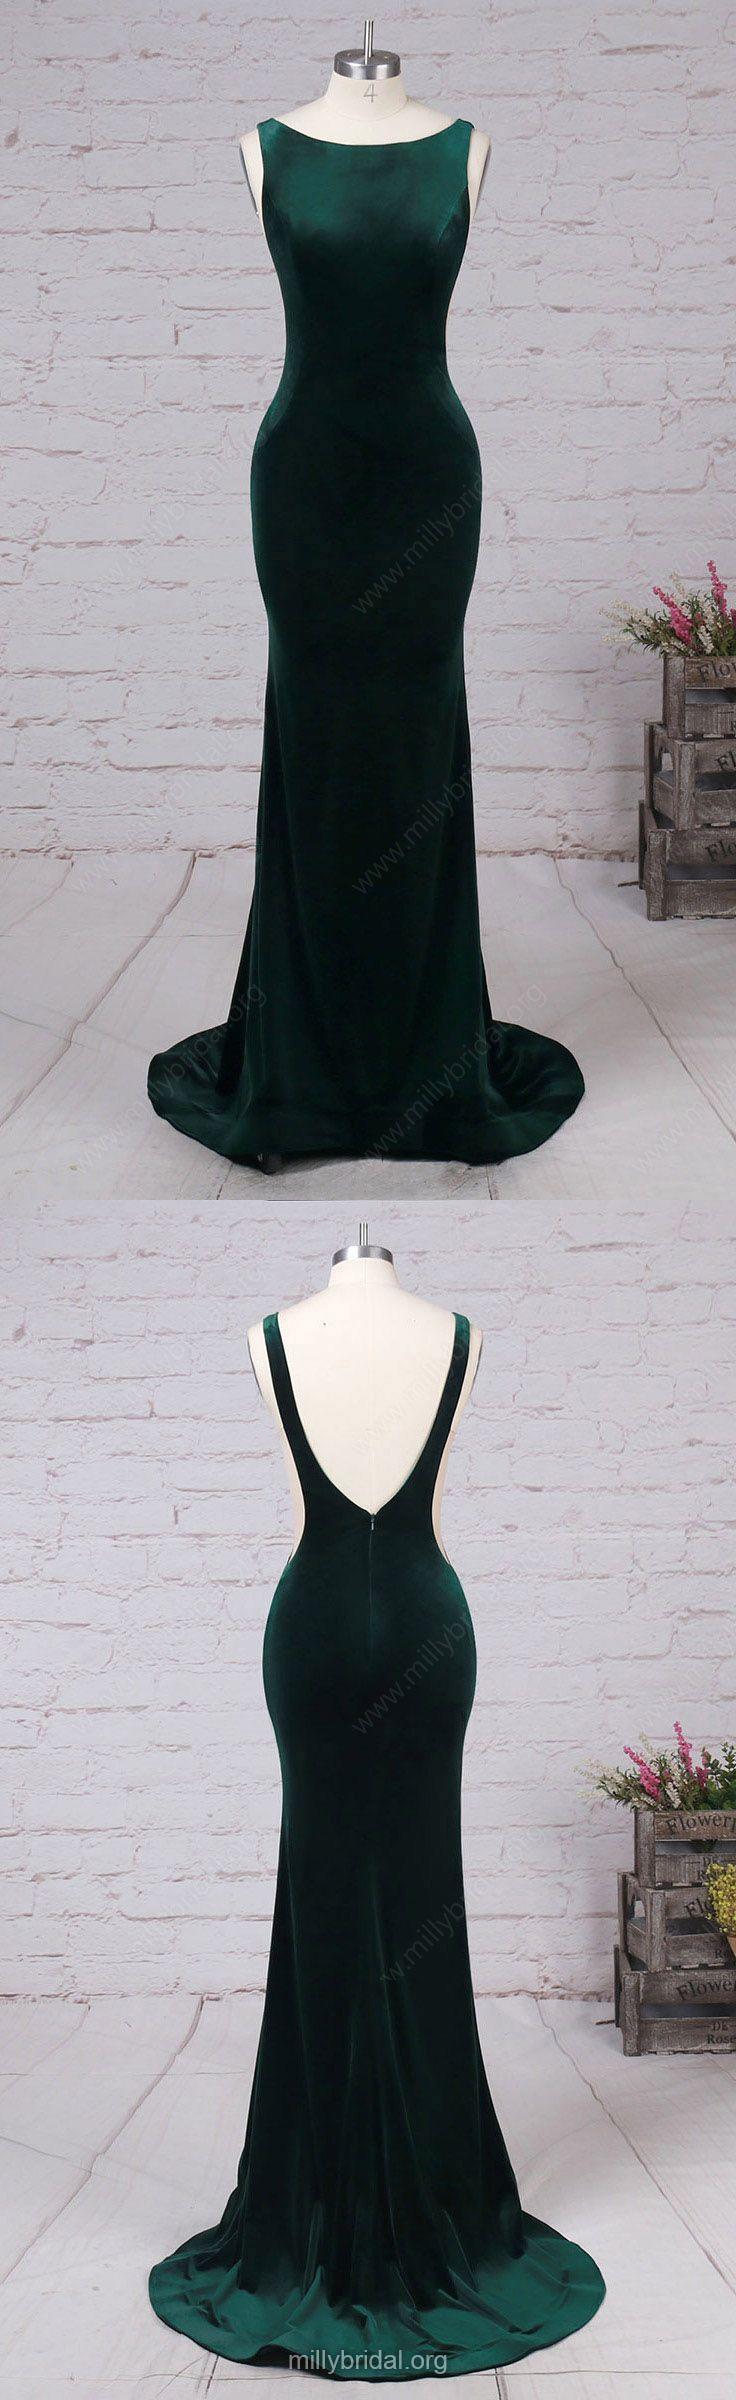 Green Prom Dresses,Long Prom Dresses,2018 Prom Dresses For Teens,Trumpet/Mermaid Formal Evening Dresses Scoop Neck, Tulle Party Pageant Dresses Velvet #greendresses